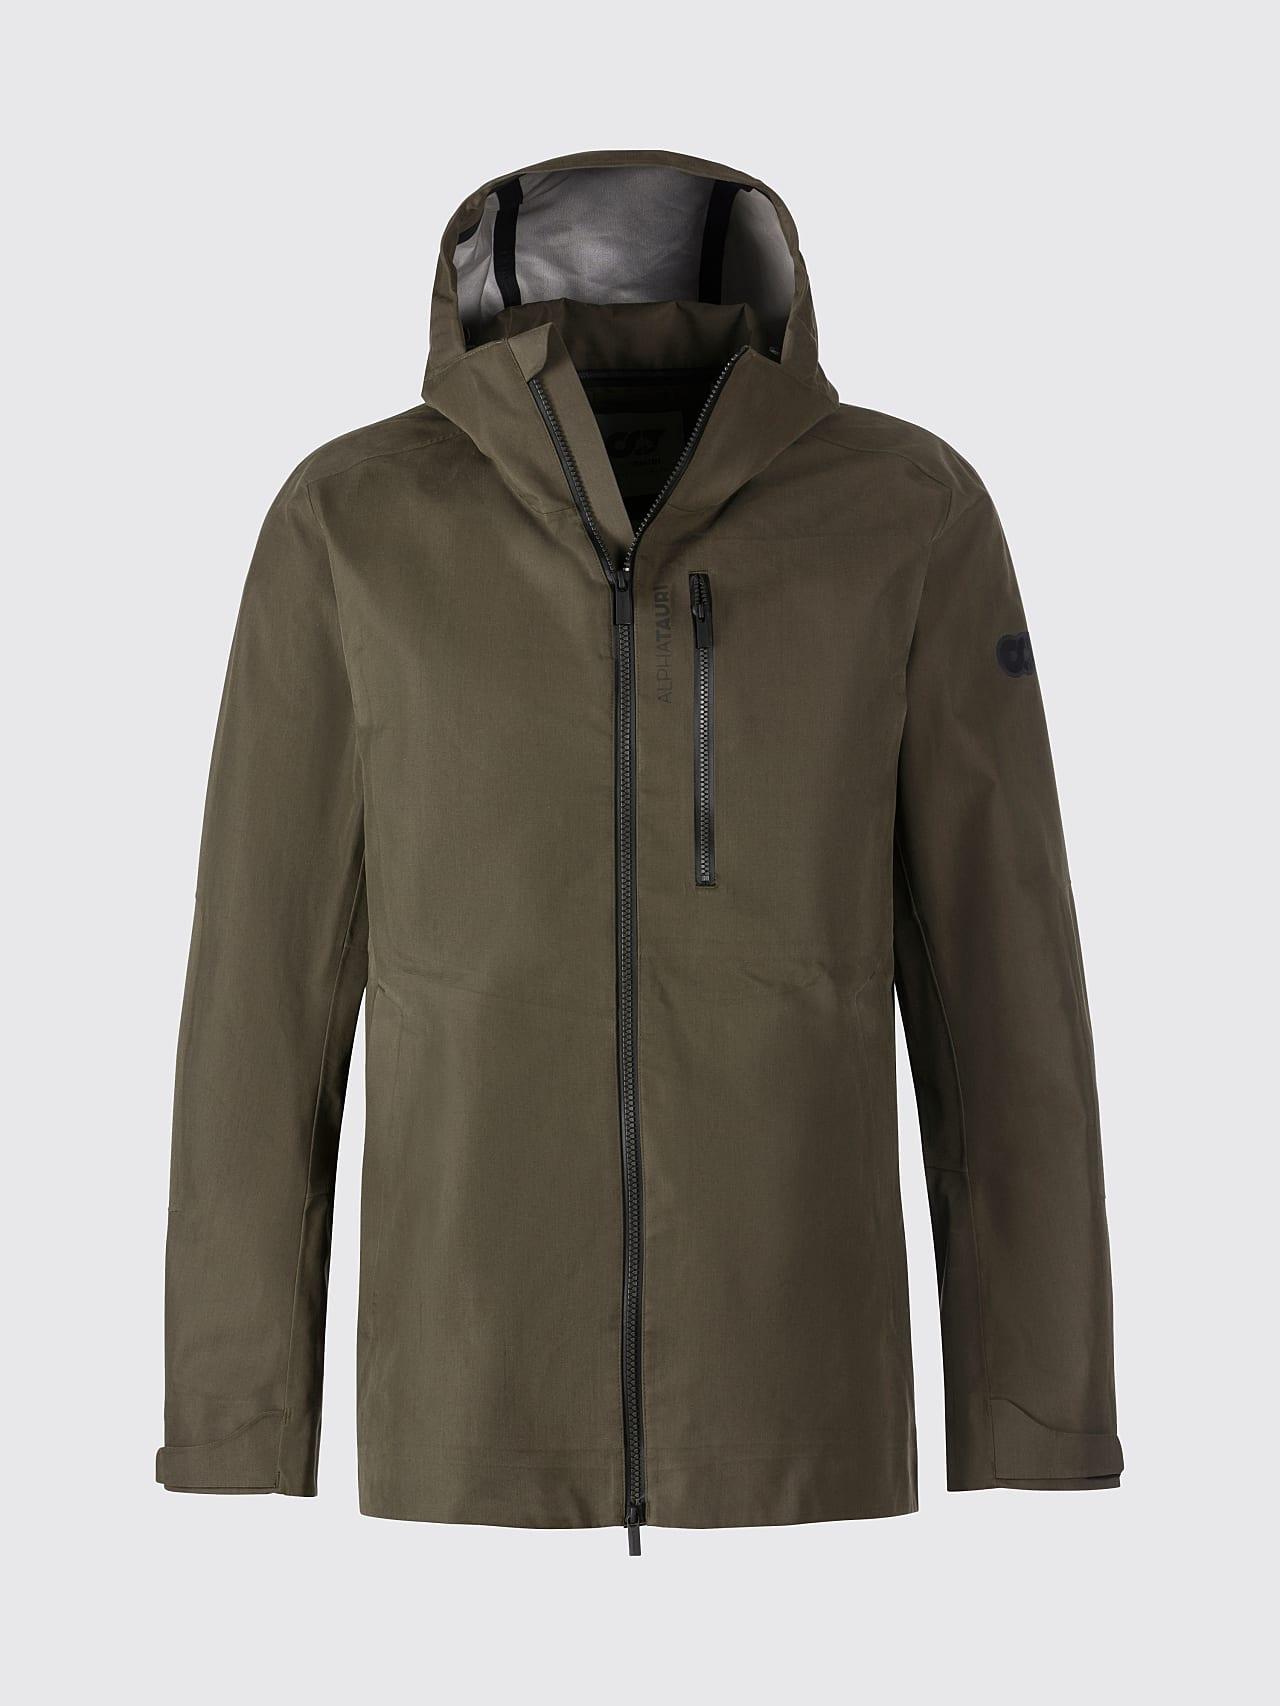 OKOVO V3.Y5.01 Packable Waterproof Jacket olive Back Alpha Tauri